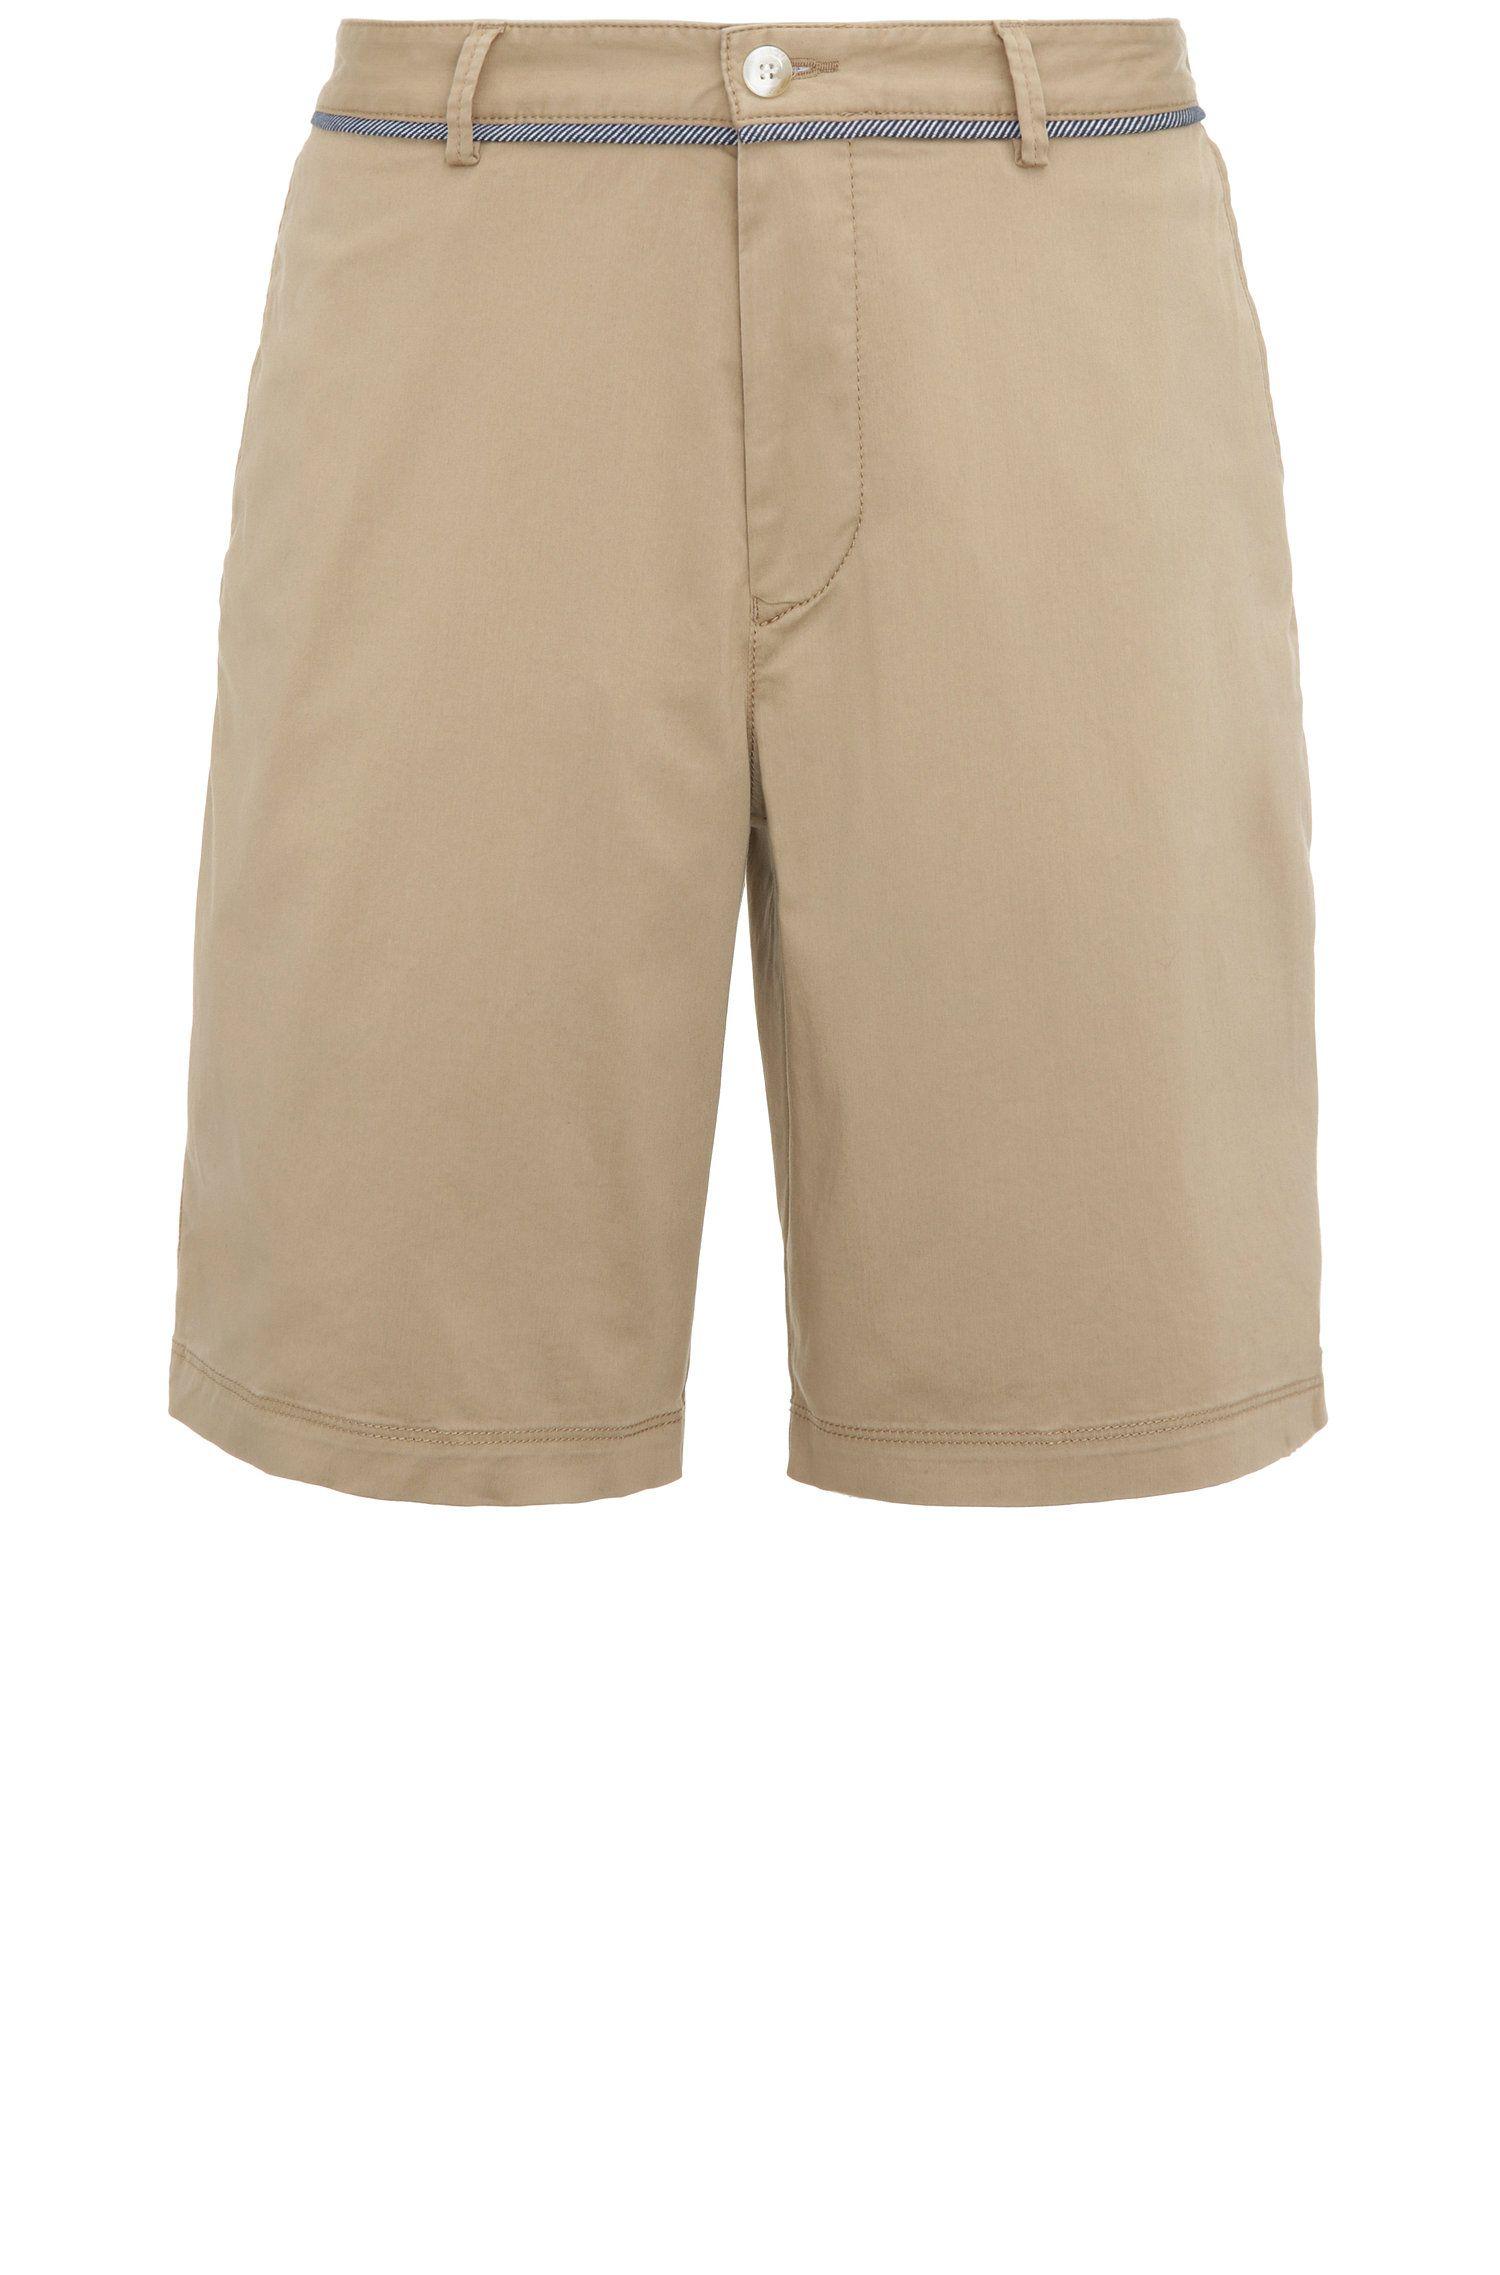 Shorts en mezcla de algodón con elastano: 'C-Clyde2-14-W'